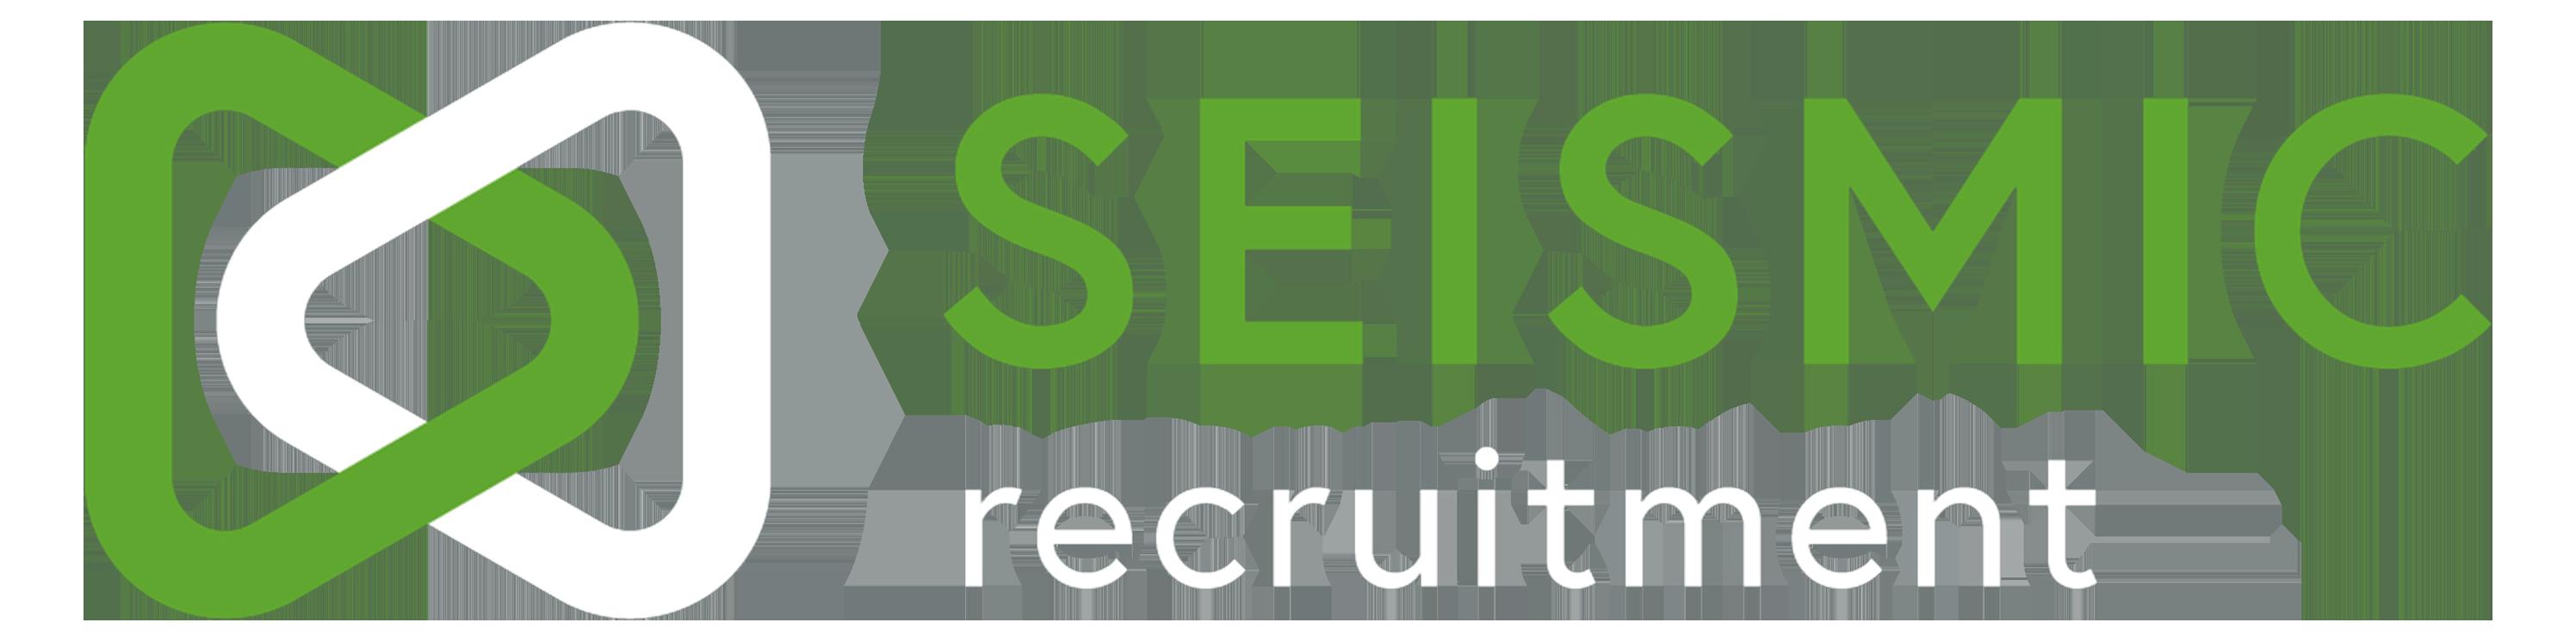 Seismic Recruitment